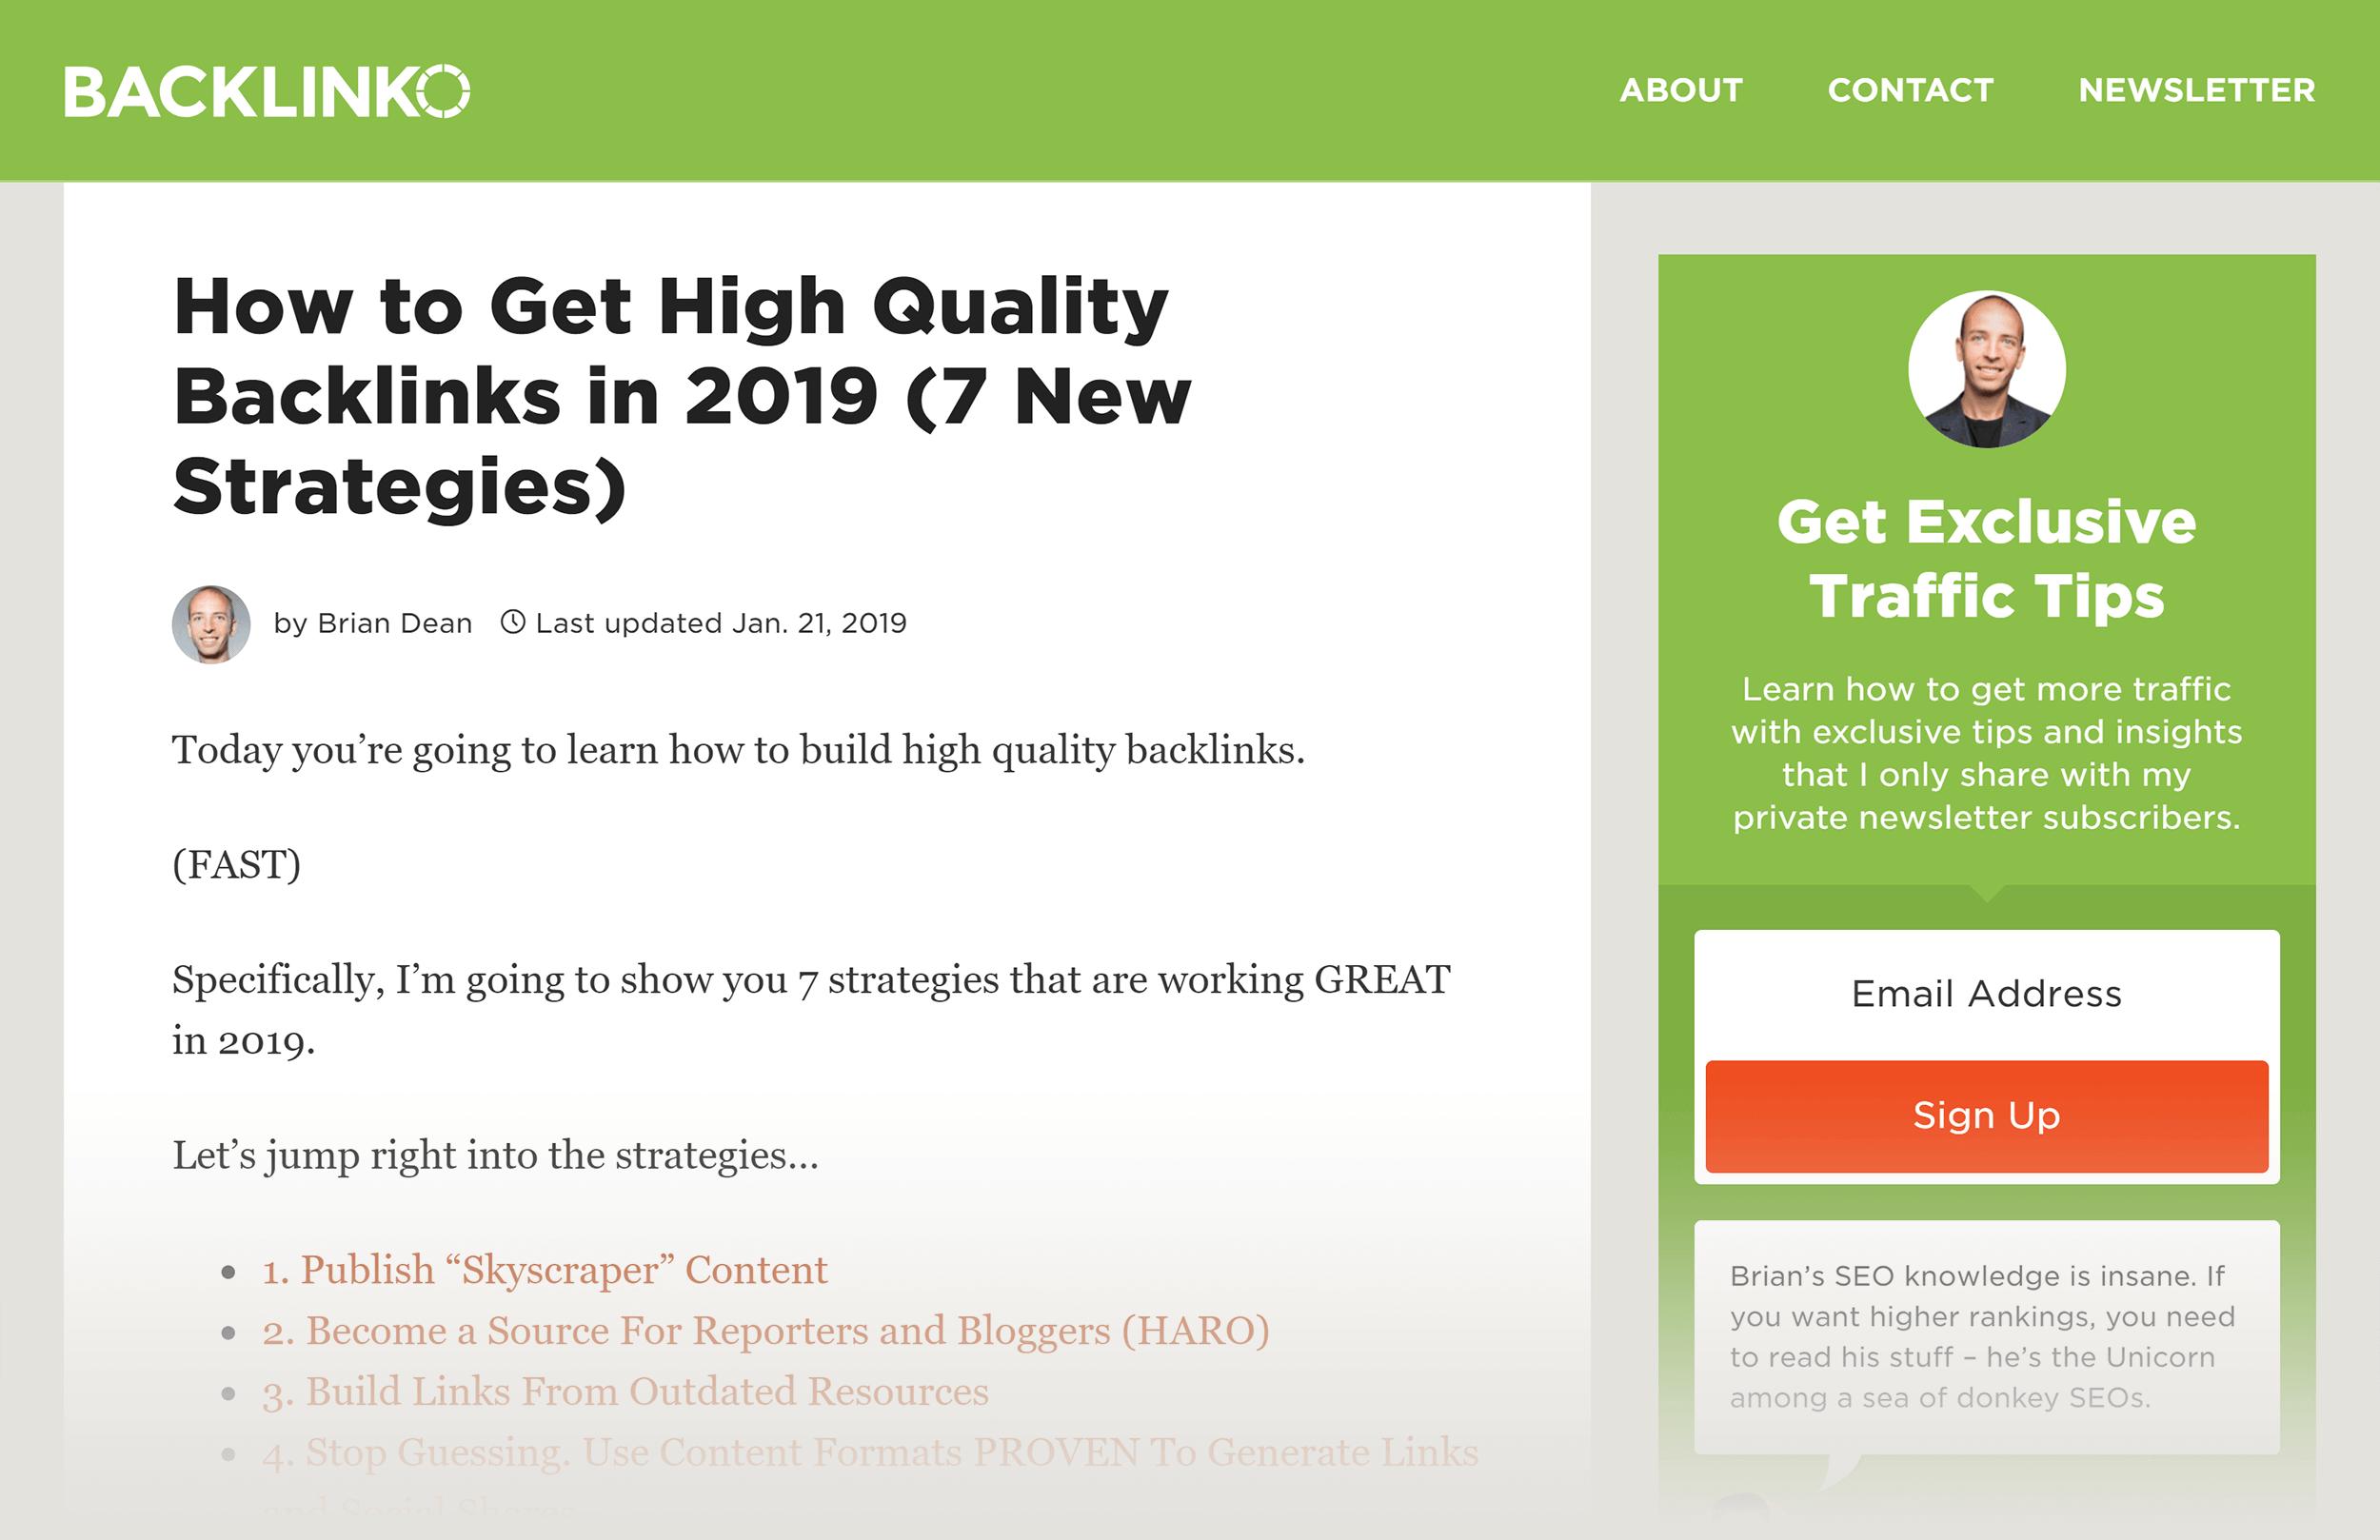 Backlinko – High Quality Backlinks